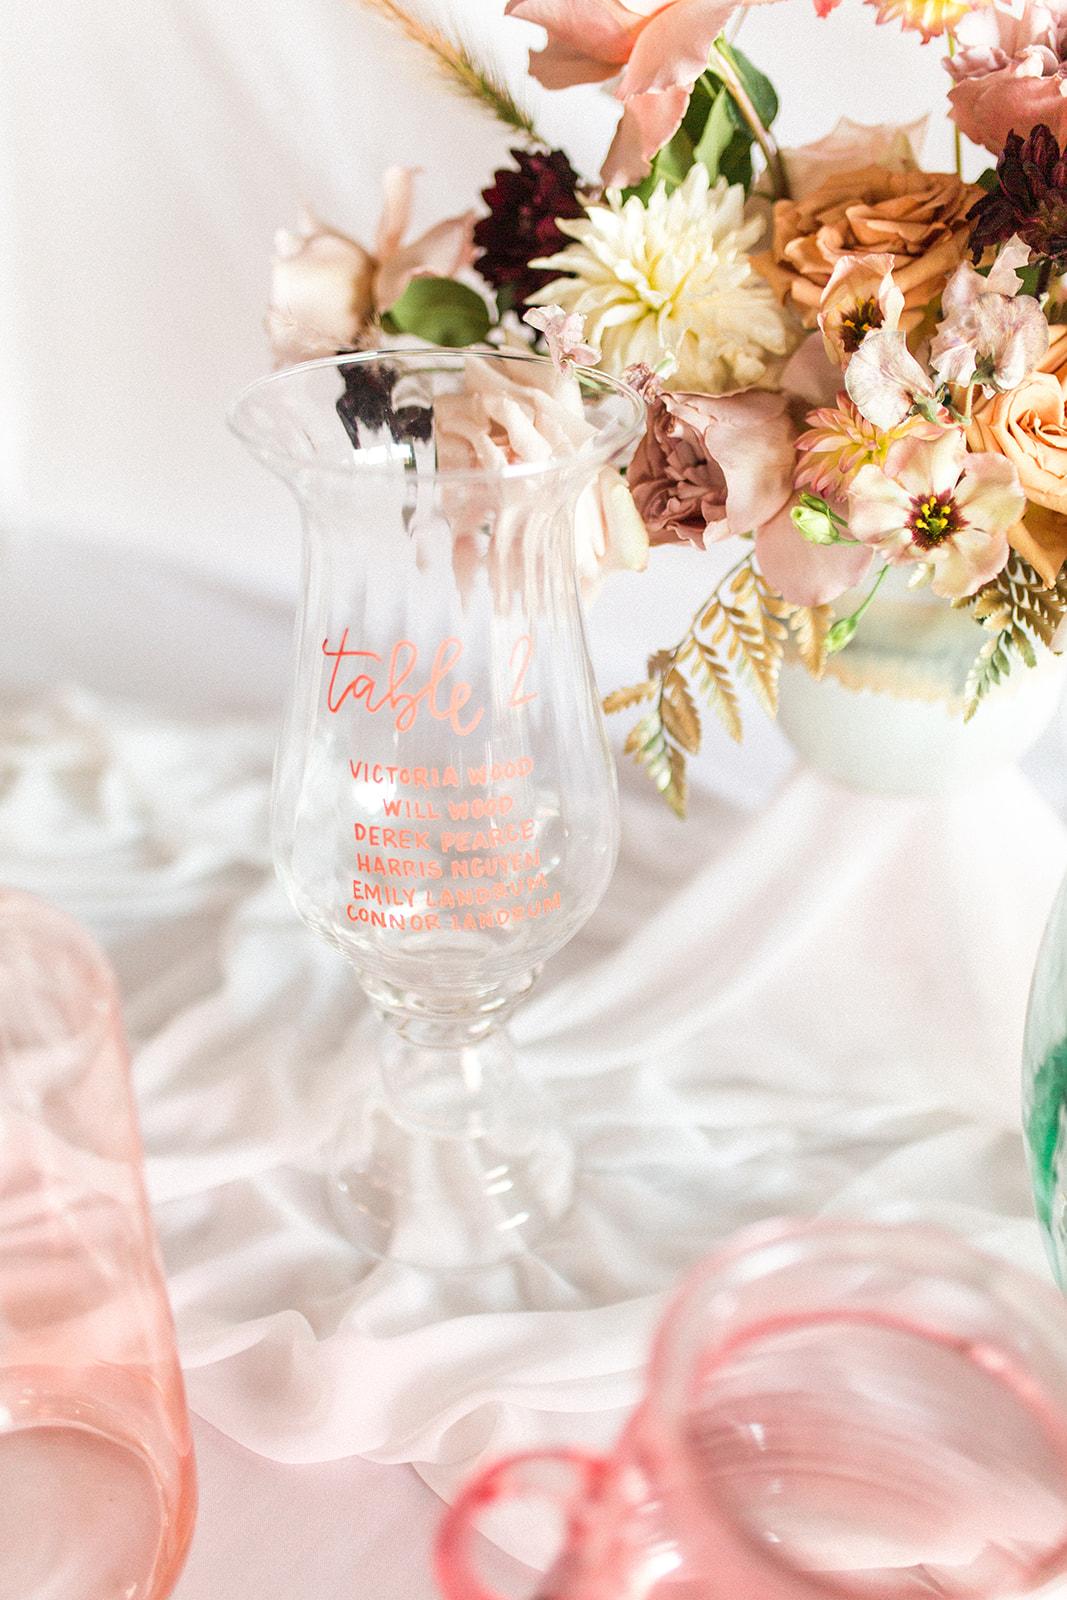 Wedding table number display ideas: Fall Garden Wedding featured on Alexa Kay Events